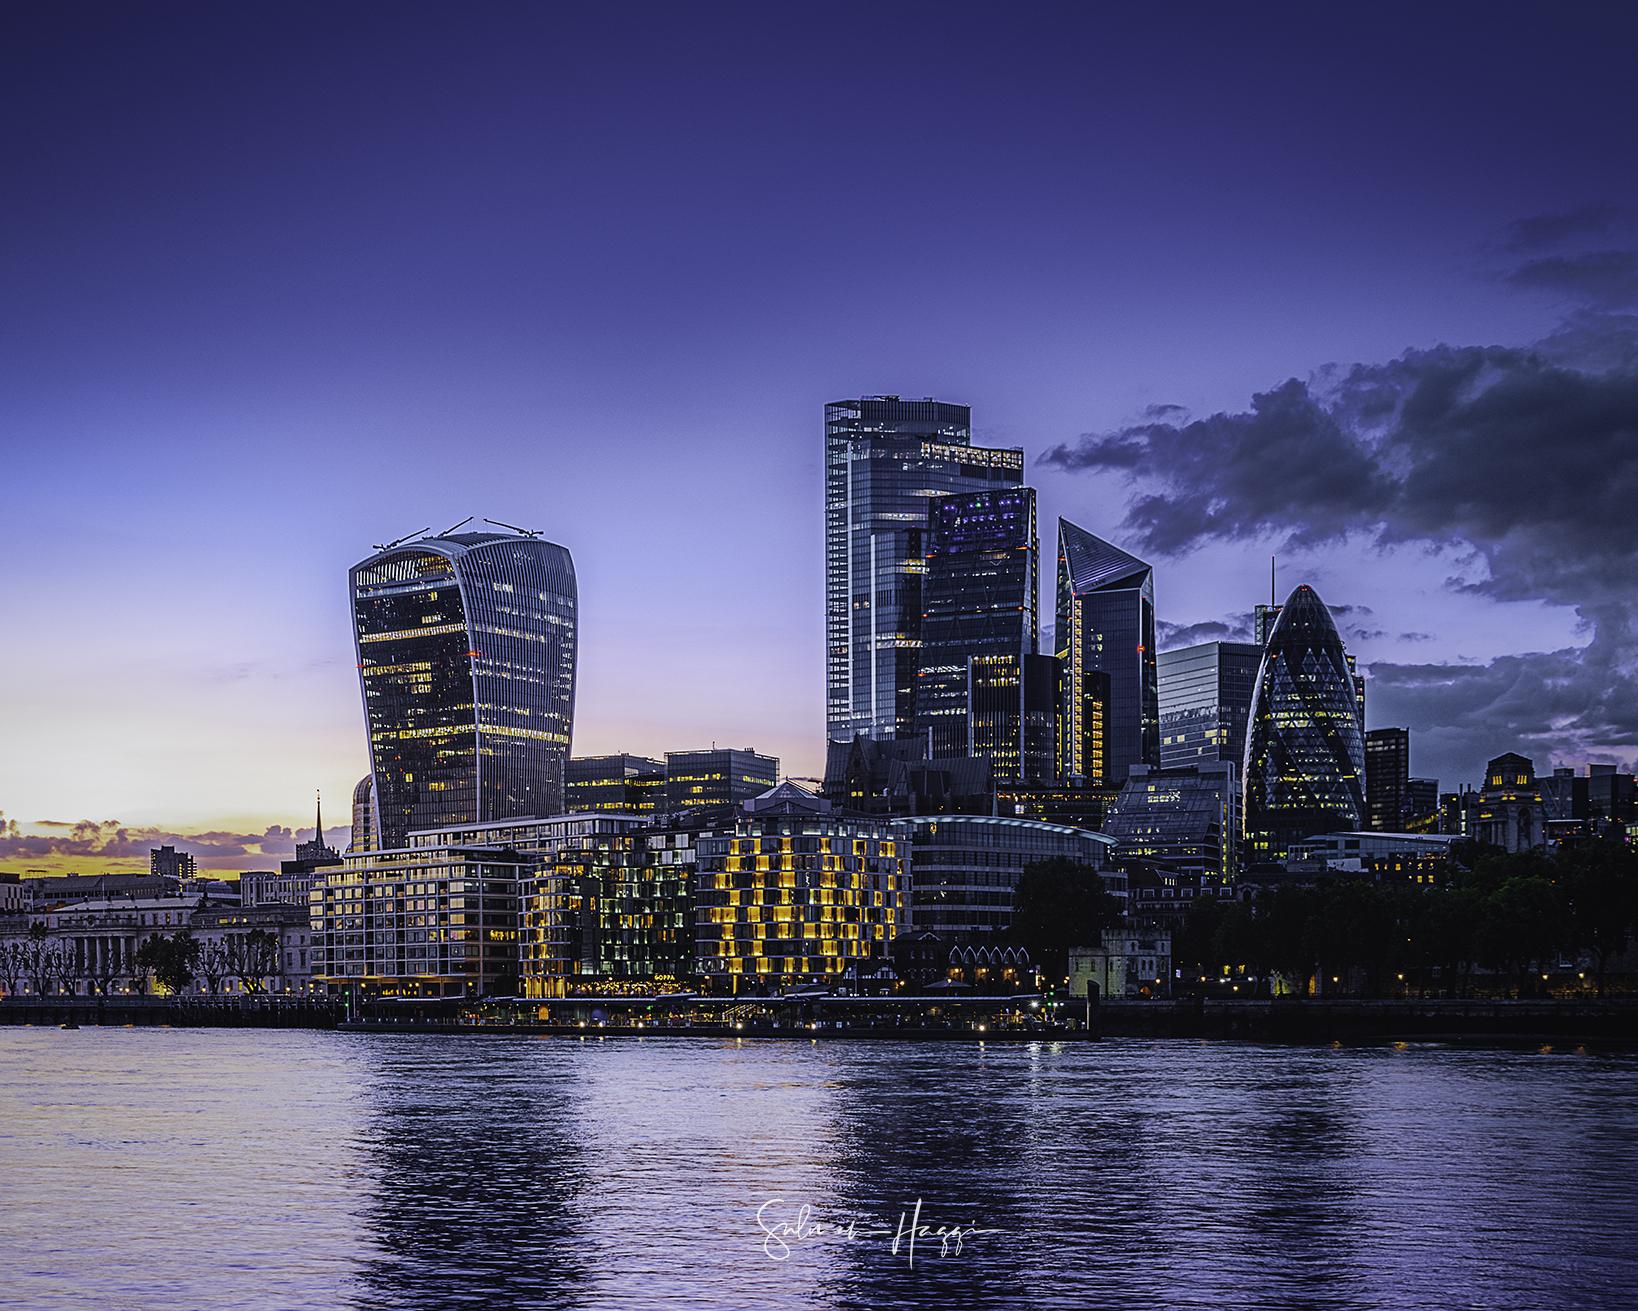 City of London Skyline, United Kingdom